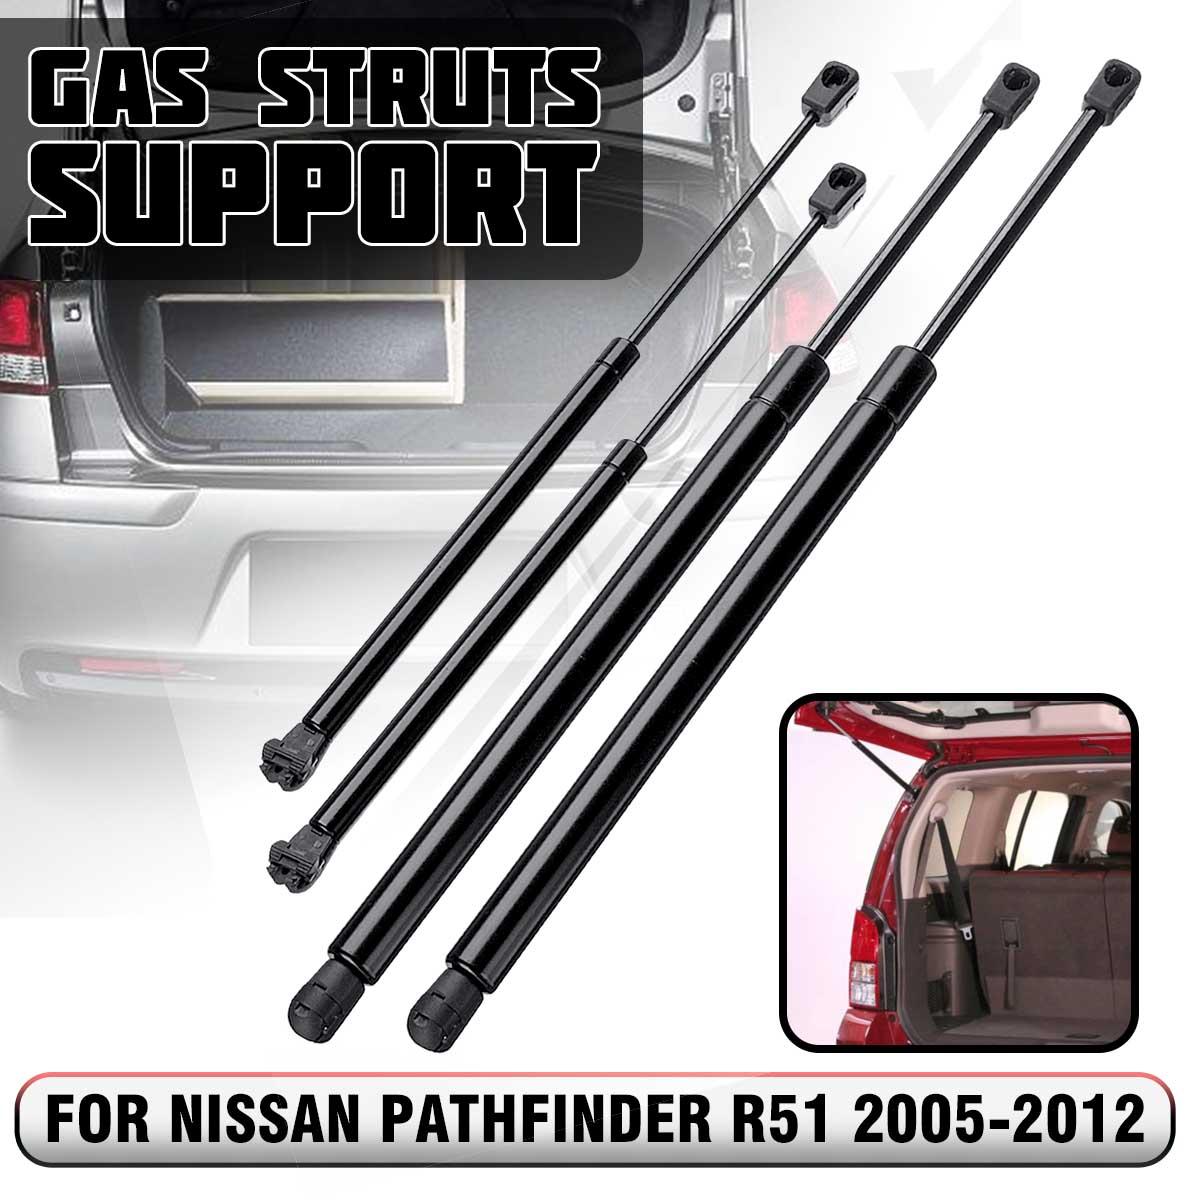 GAS STRUTS SUIT GLASS WINDOW R 51 NISSAN PATHFINDER YEAR 2005-2012 NEW PAIR